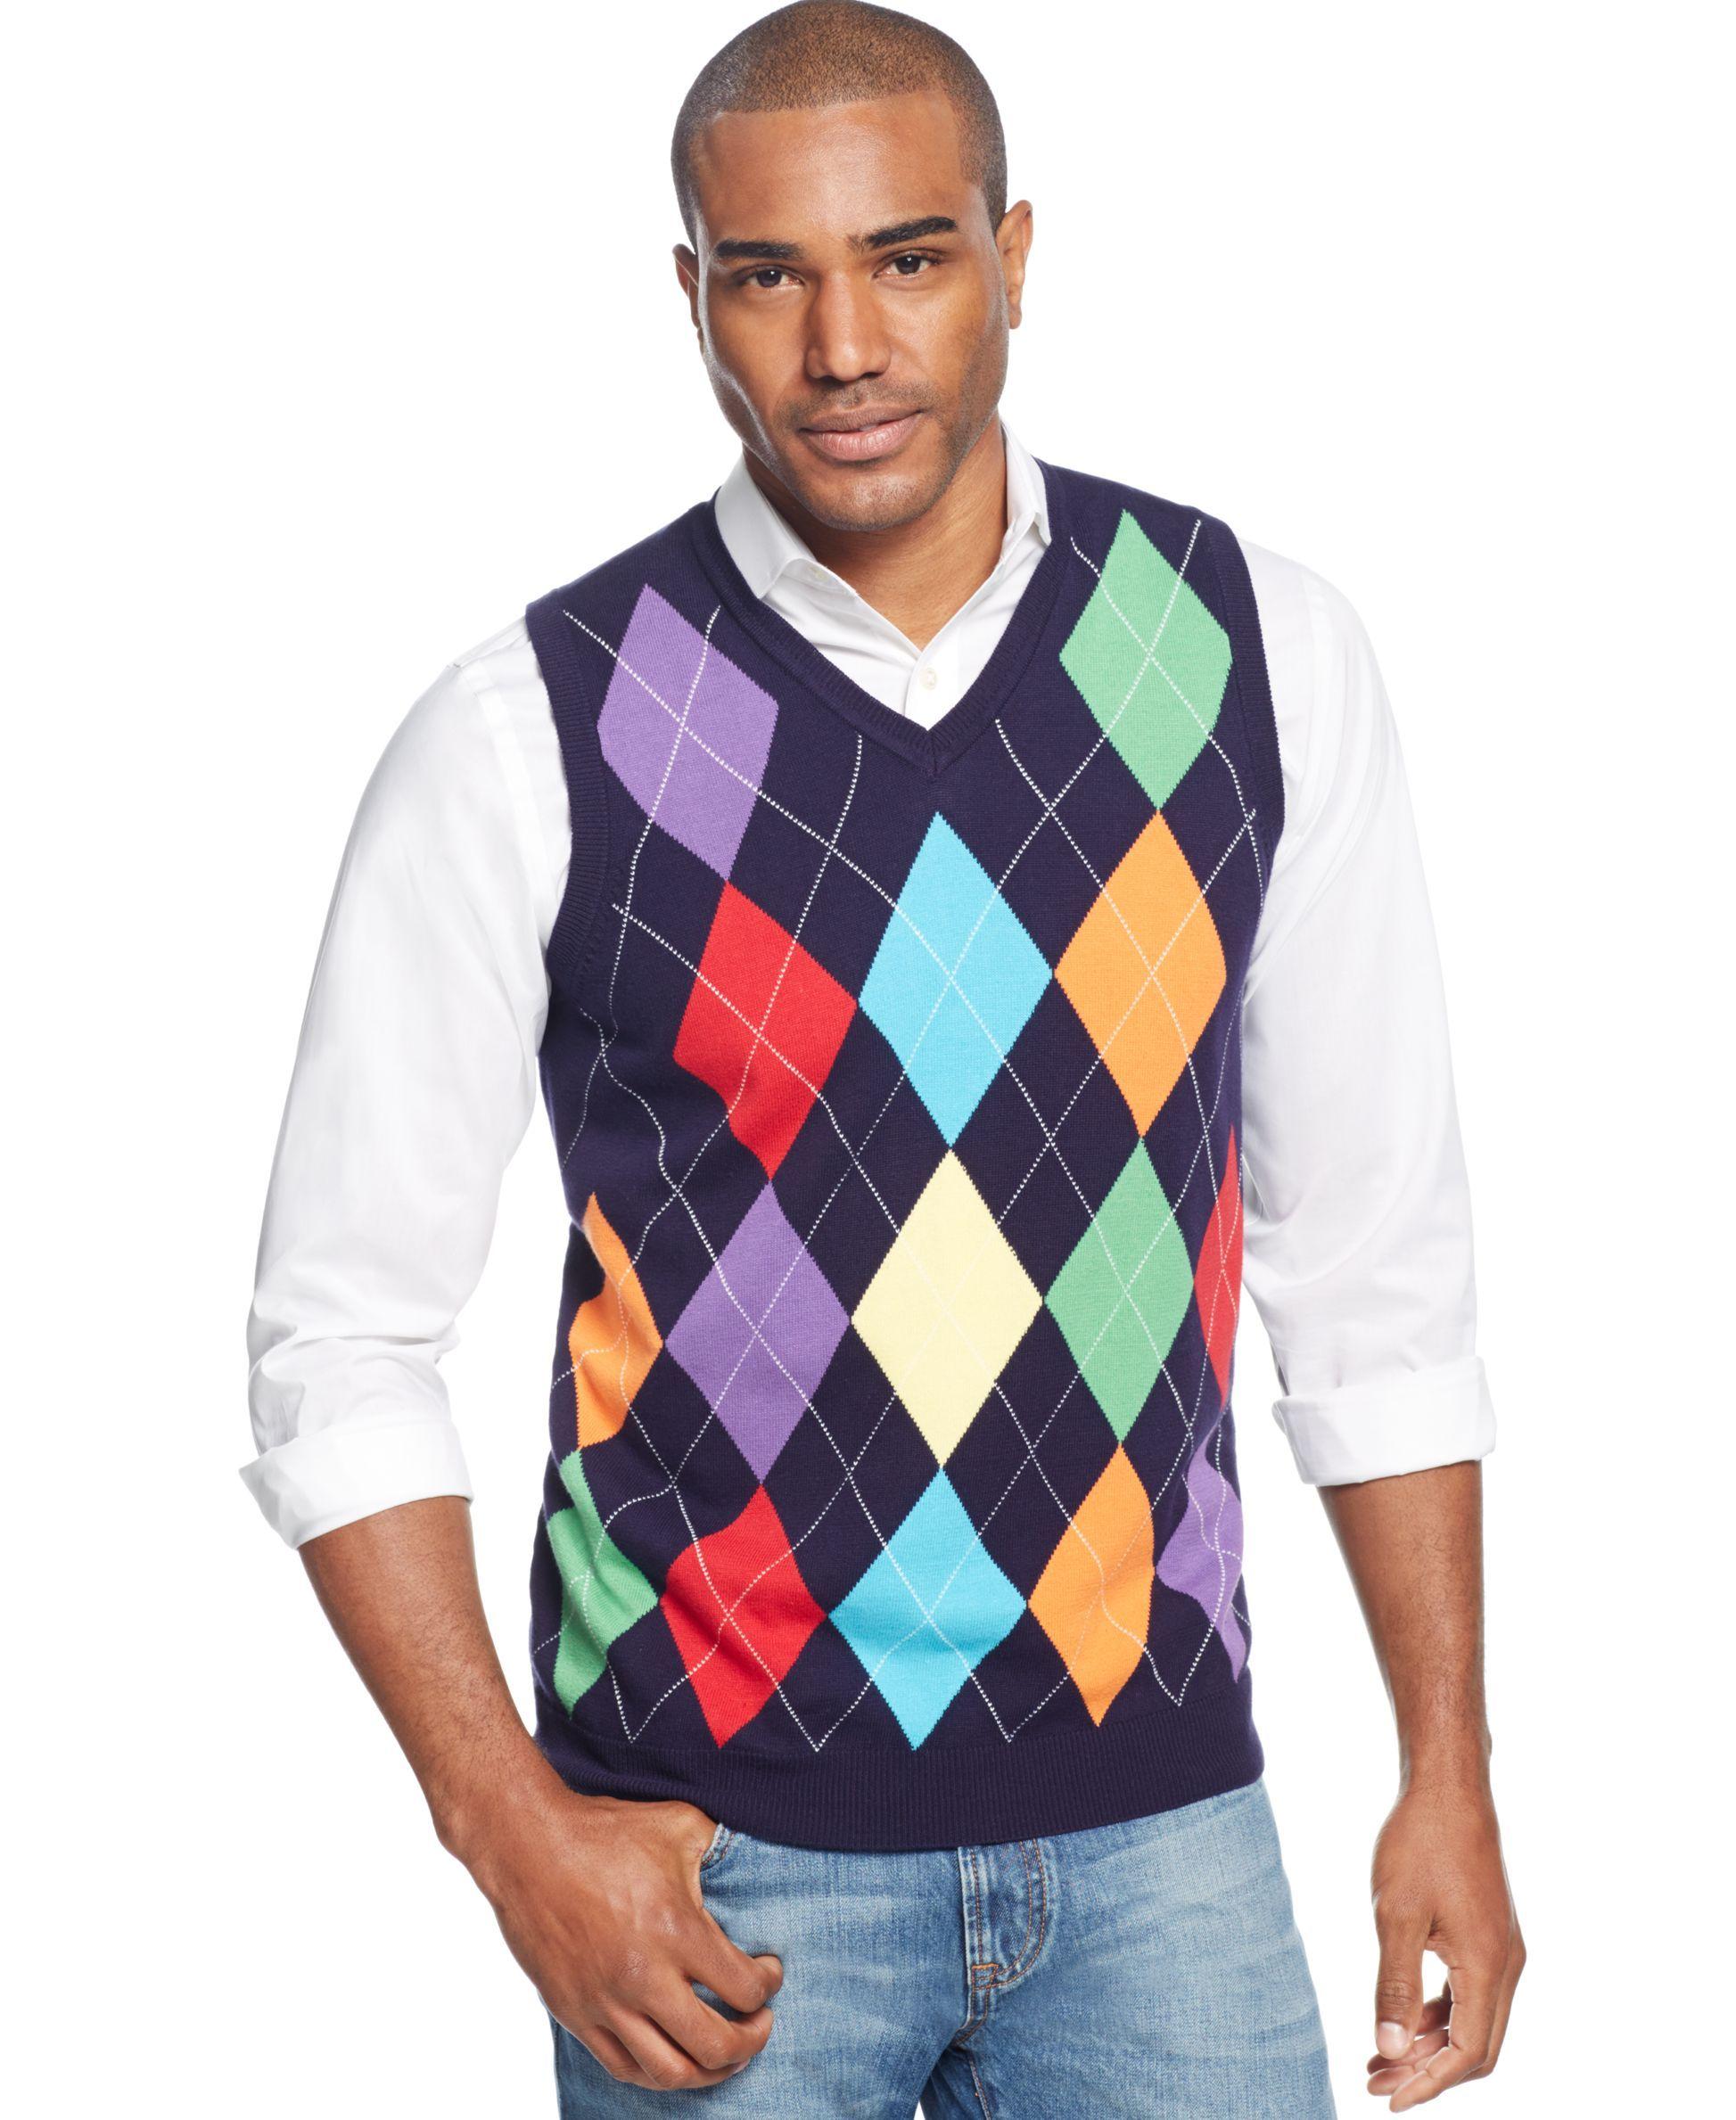 6f1ebf95b Argyle Culture V-Neck Argyle Sweater Vest